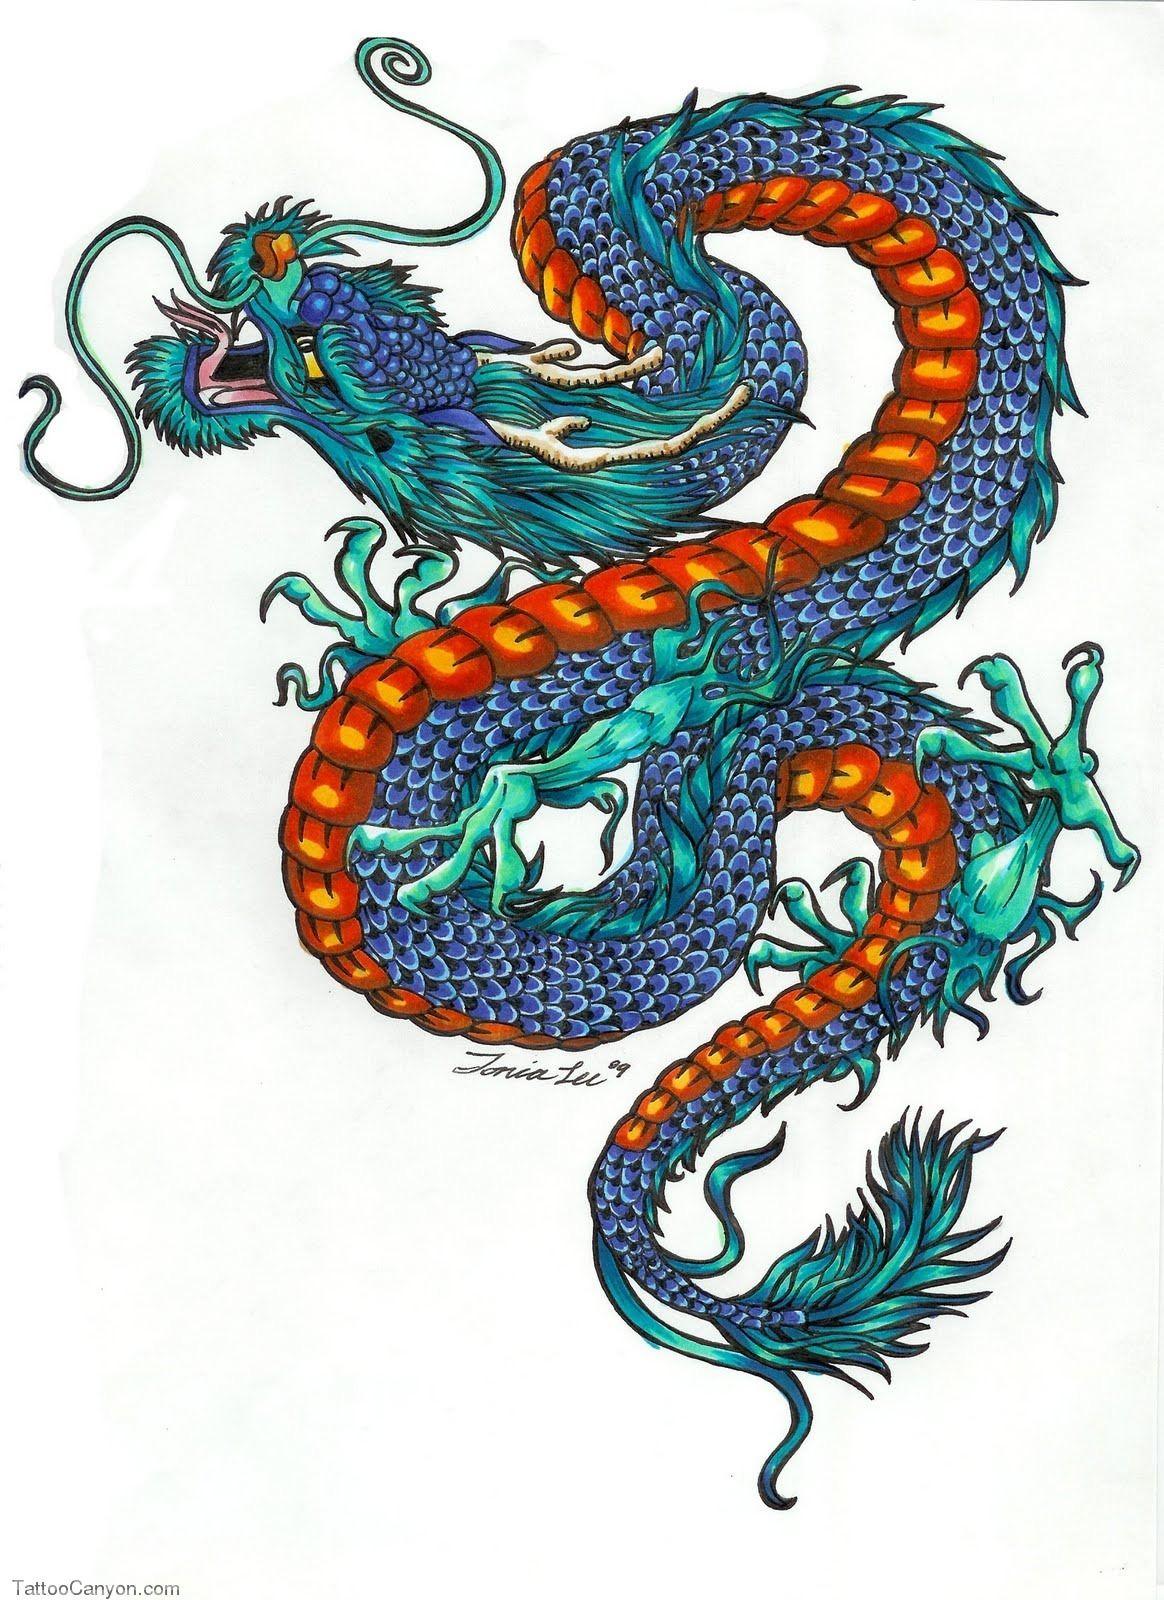 Free Printables Dragon Tattoos Design Free Printable Tattoo Stencils Tattoo Design Gallery Dragon Tattoo Stencil Dragon Tattoo Drawing Printable Tattoos